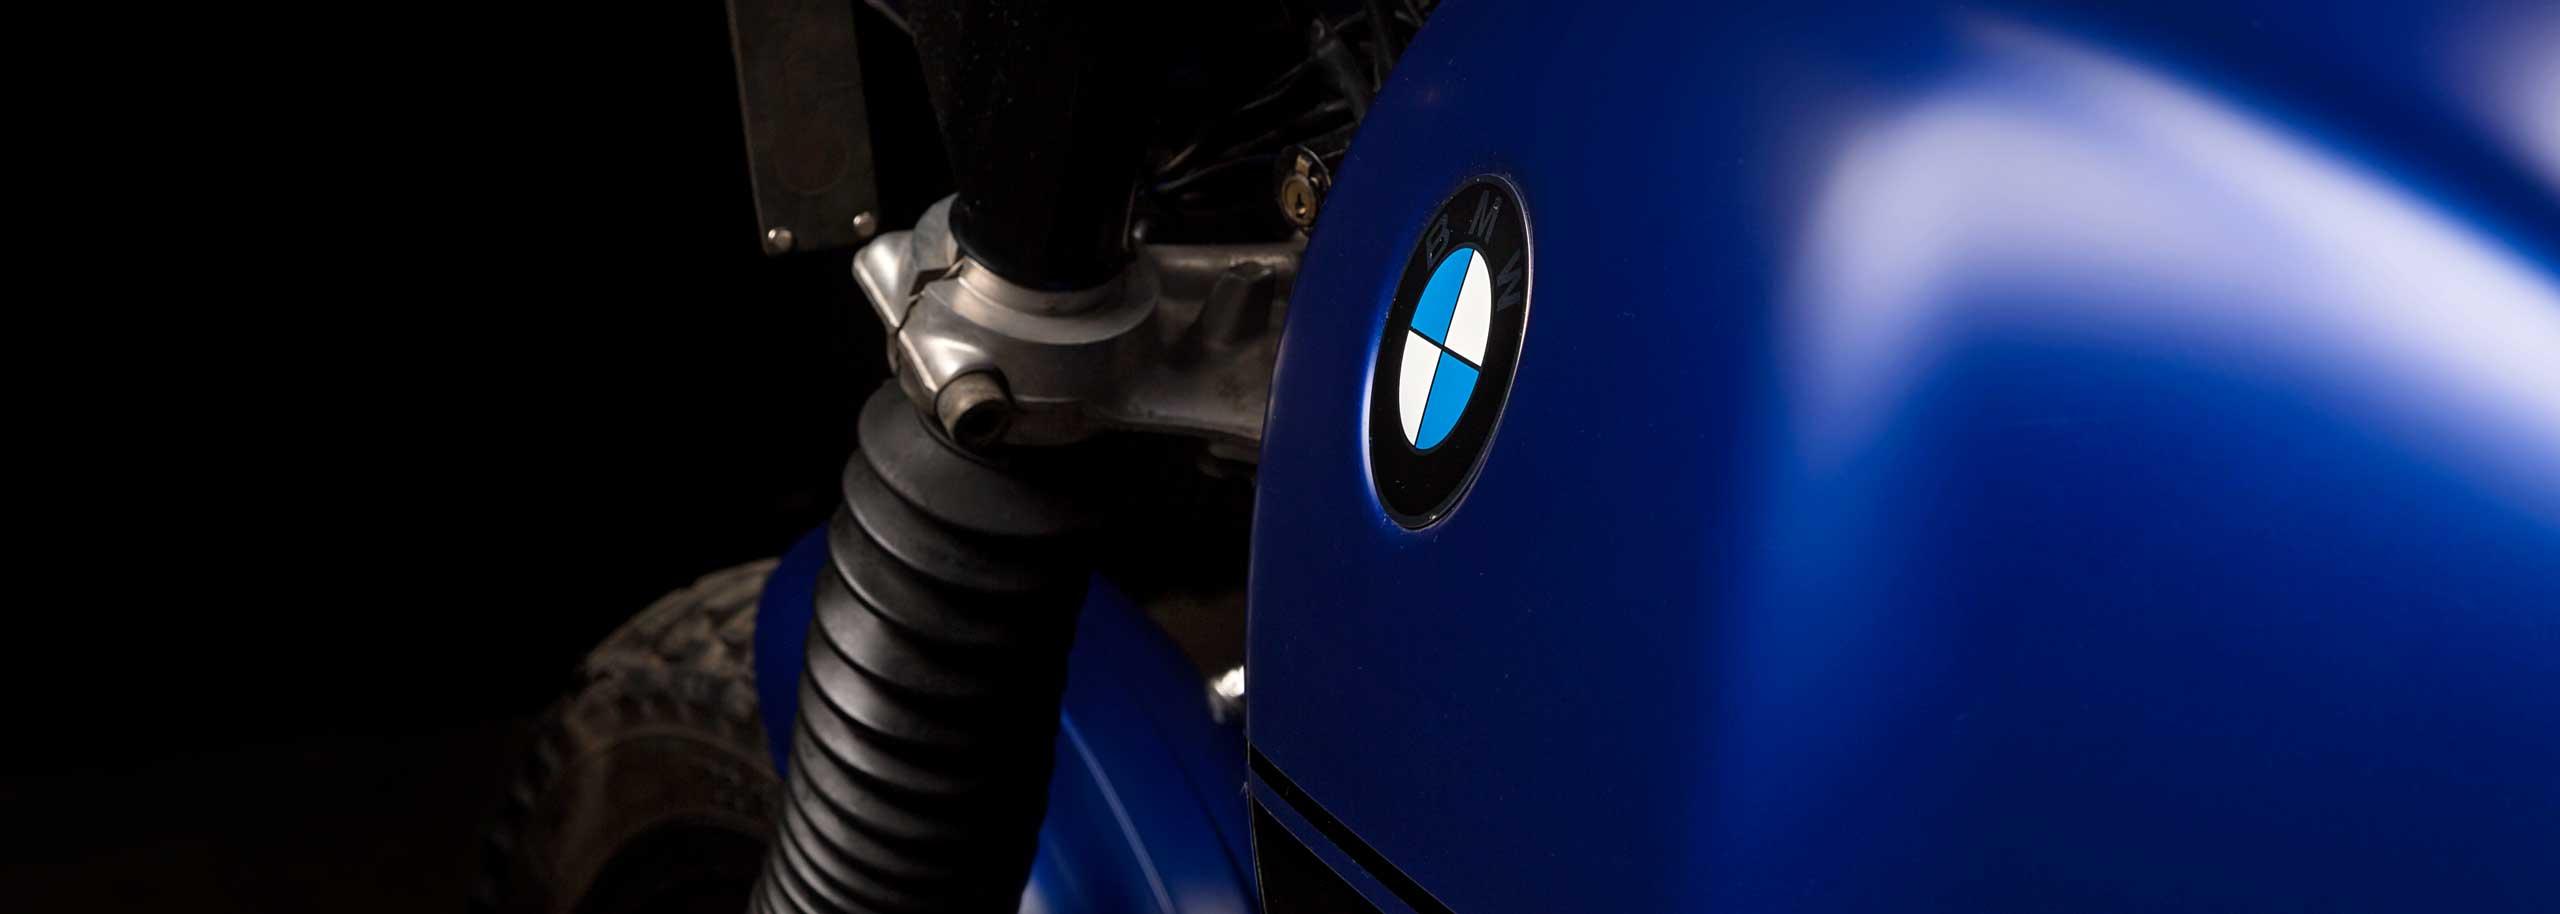 02_TITAN-Milano_BMW-R100-RS_Cafe-Racer-Motorrad-Umbau-Graz-Austria-Heidenau_BMW-Motorrad-Umbauten_individuell-TYPISIERT